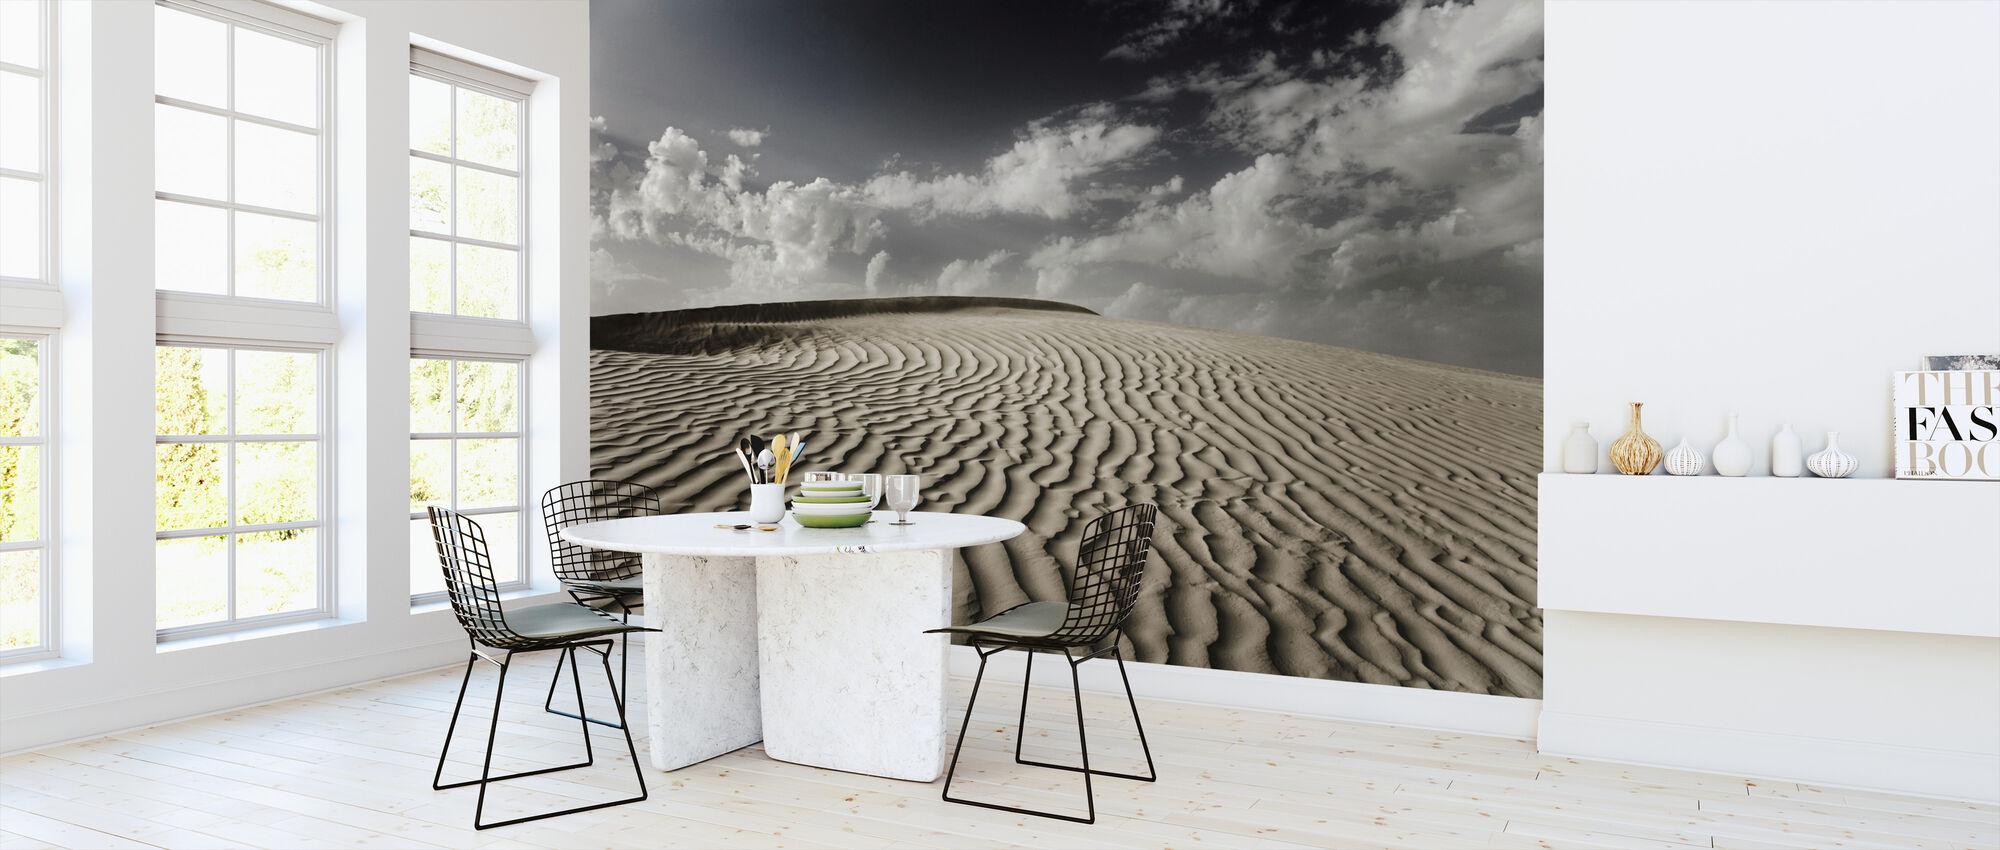 WoestijnduinSahara - Behang - Keuken